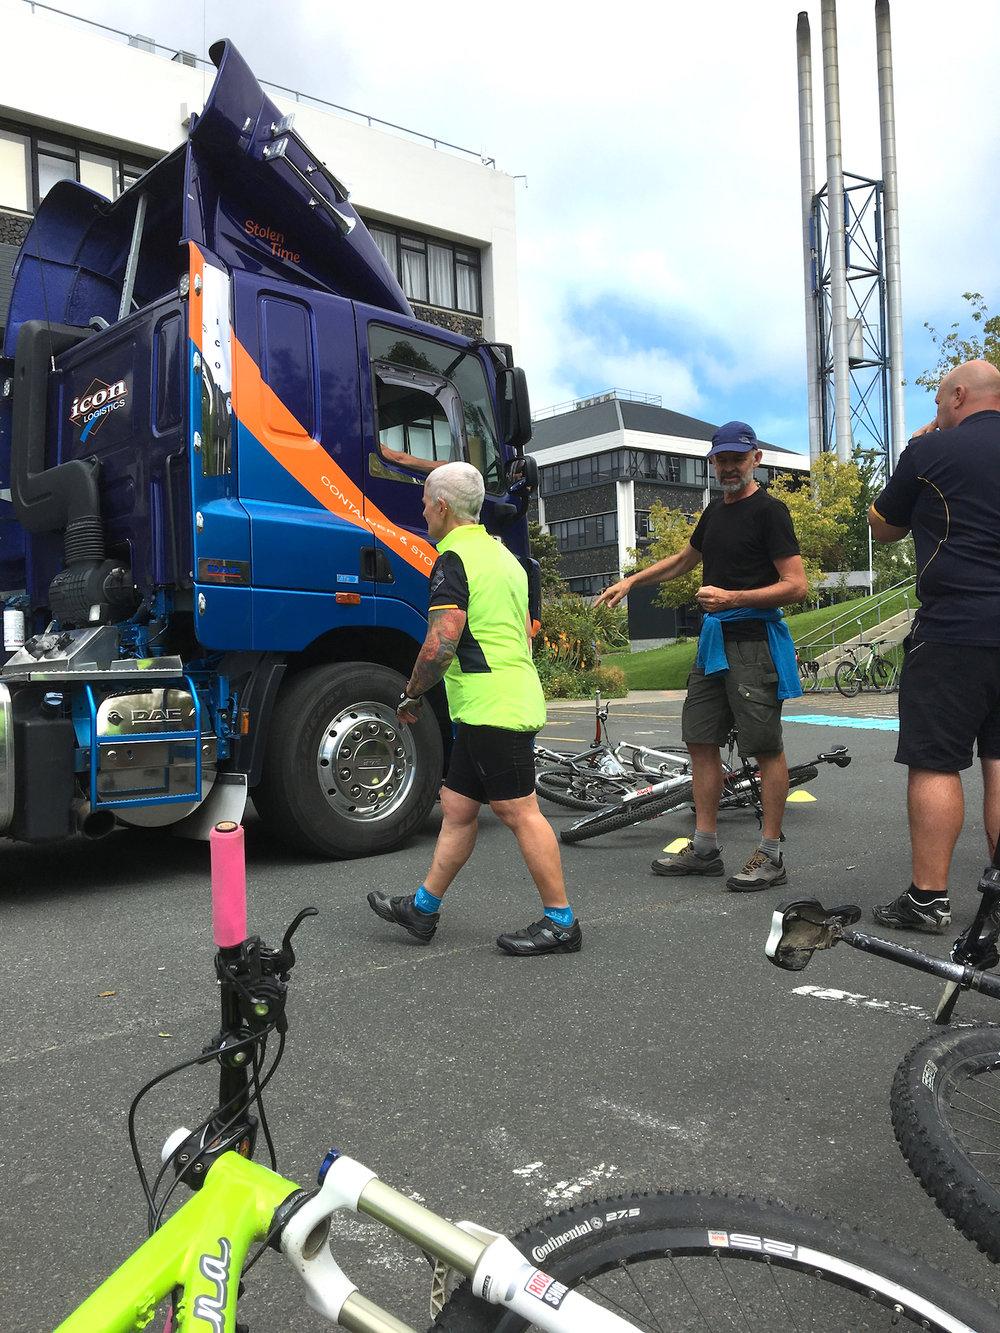 Dunedin-CyclistsTakeTurns copy.jpg